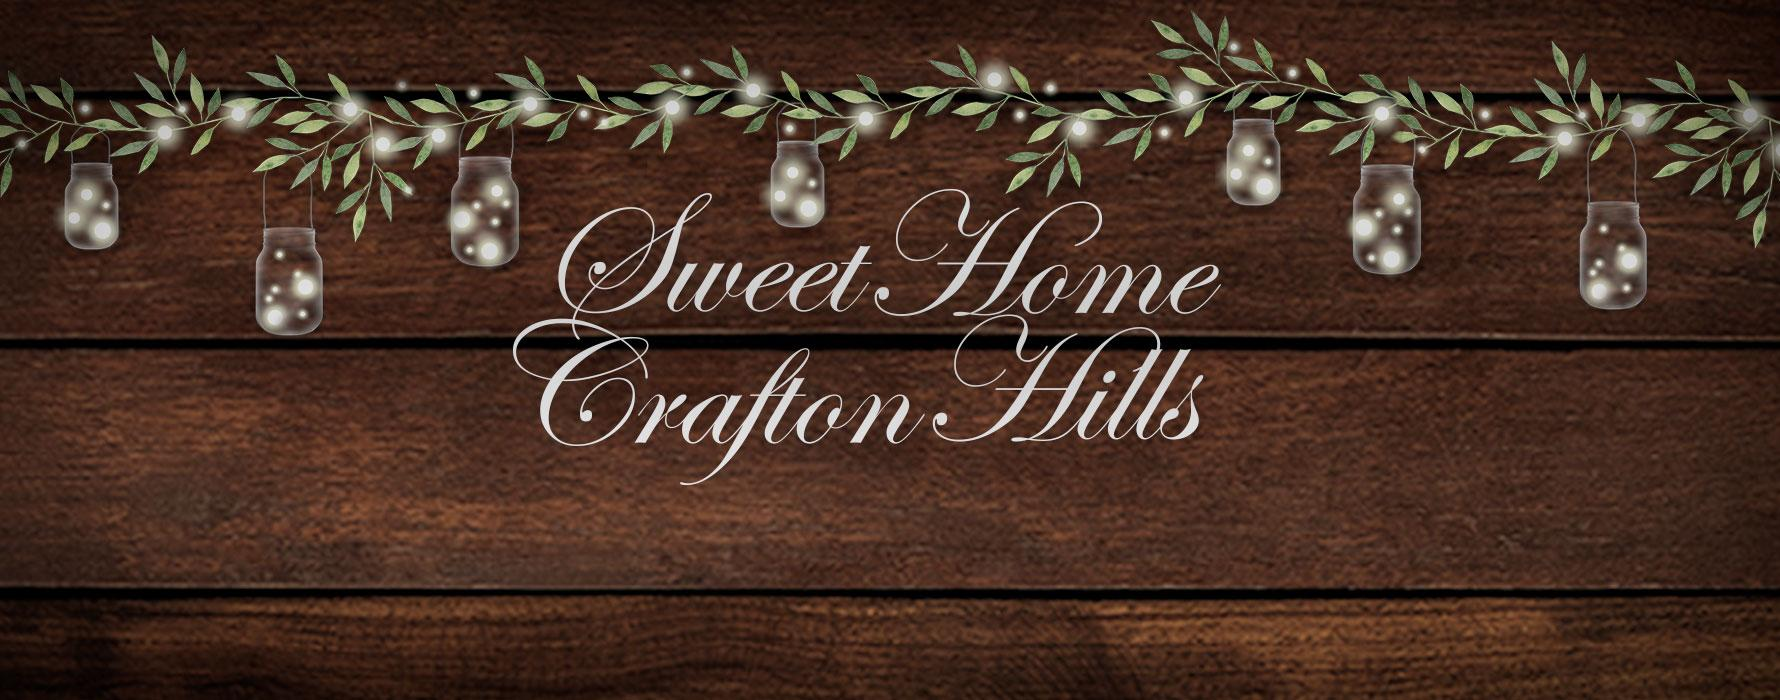 Sweet Home Crafton Hills